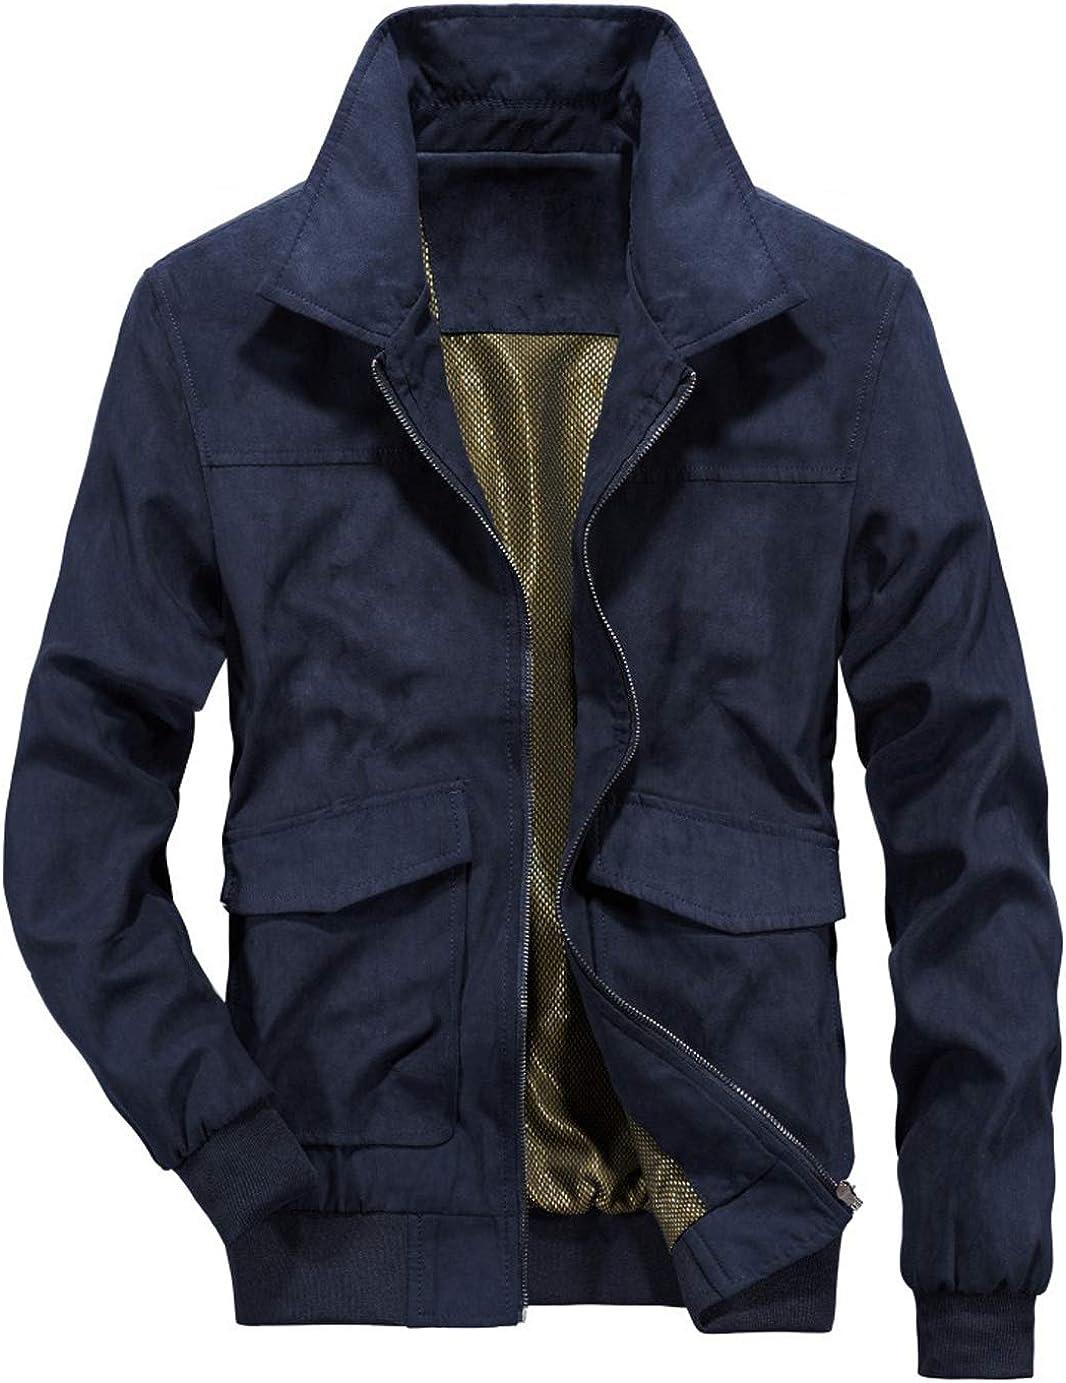 chouyatou New life Houston Mall Men's Vintage Flat Collar Leath Suede Regular Work Zip